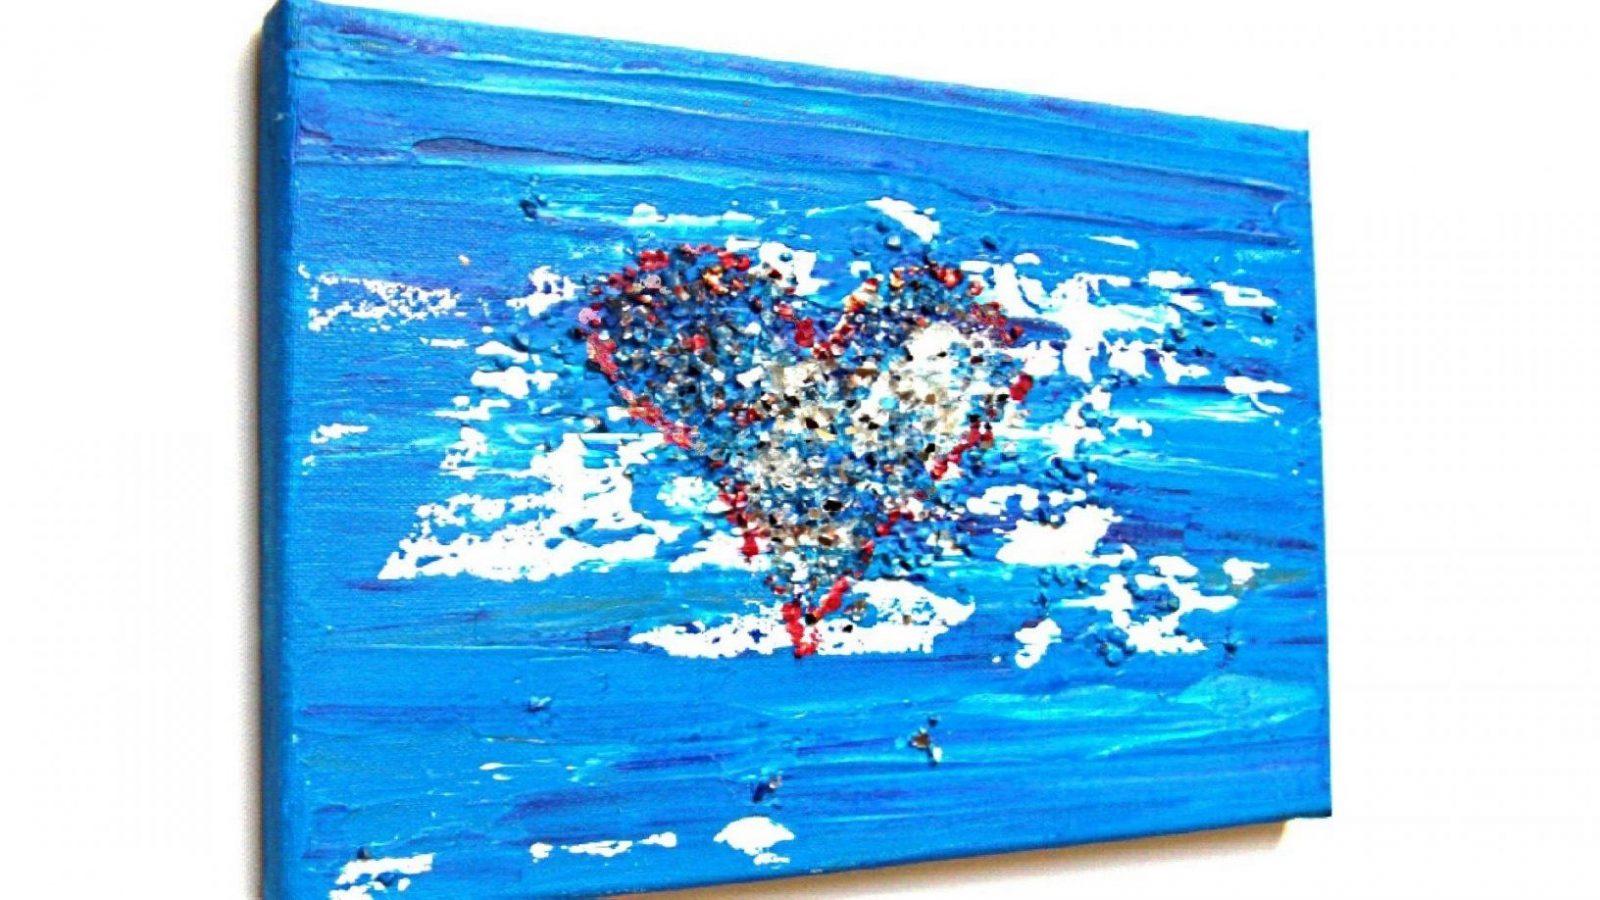 Herz Acryl Malen Für Anfänger (Heart Acrylic Painting For von Abstrakt Malen Für Anfänger Bild